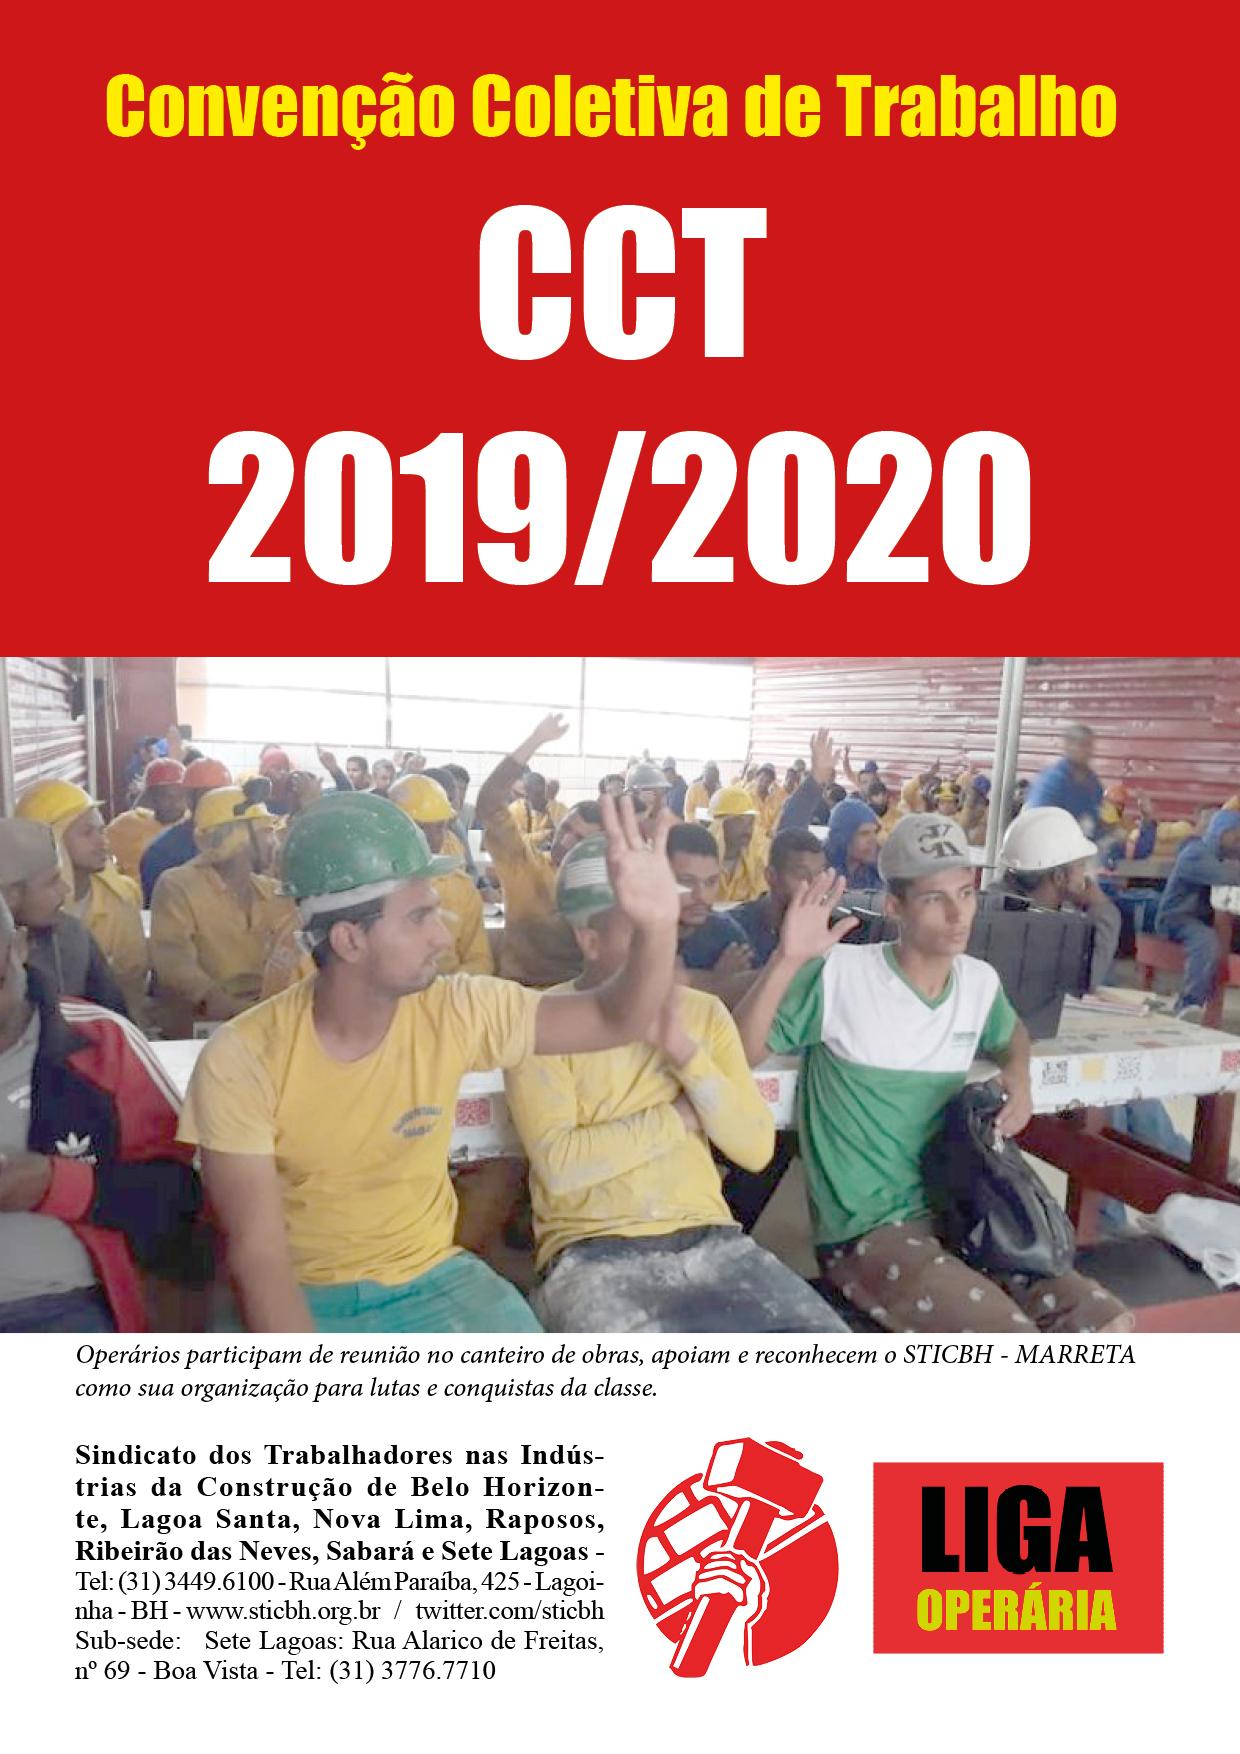 CCT 2019/2020